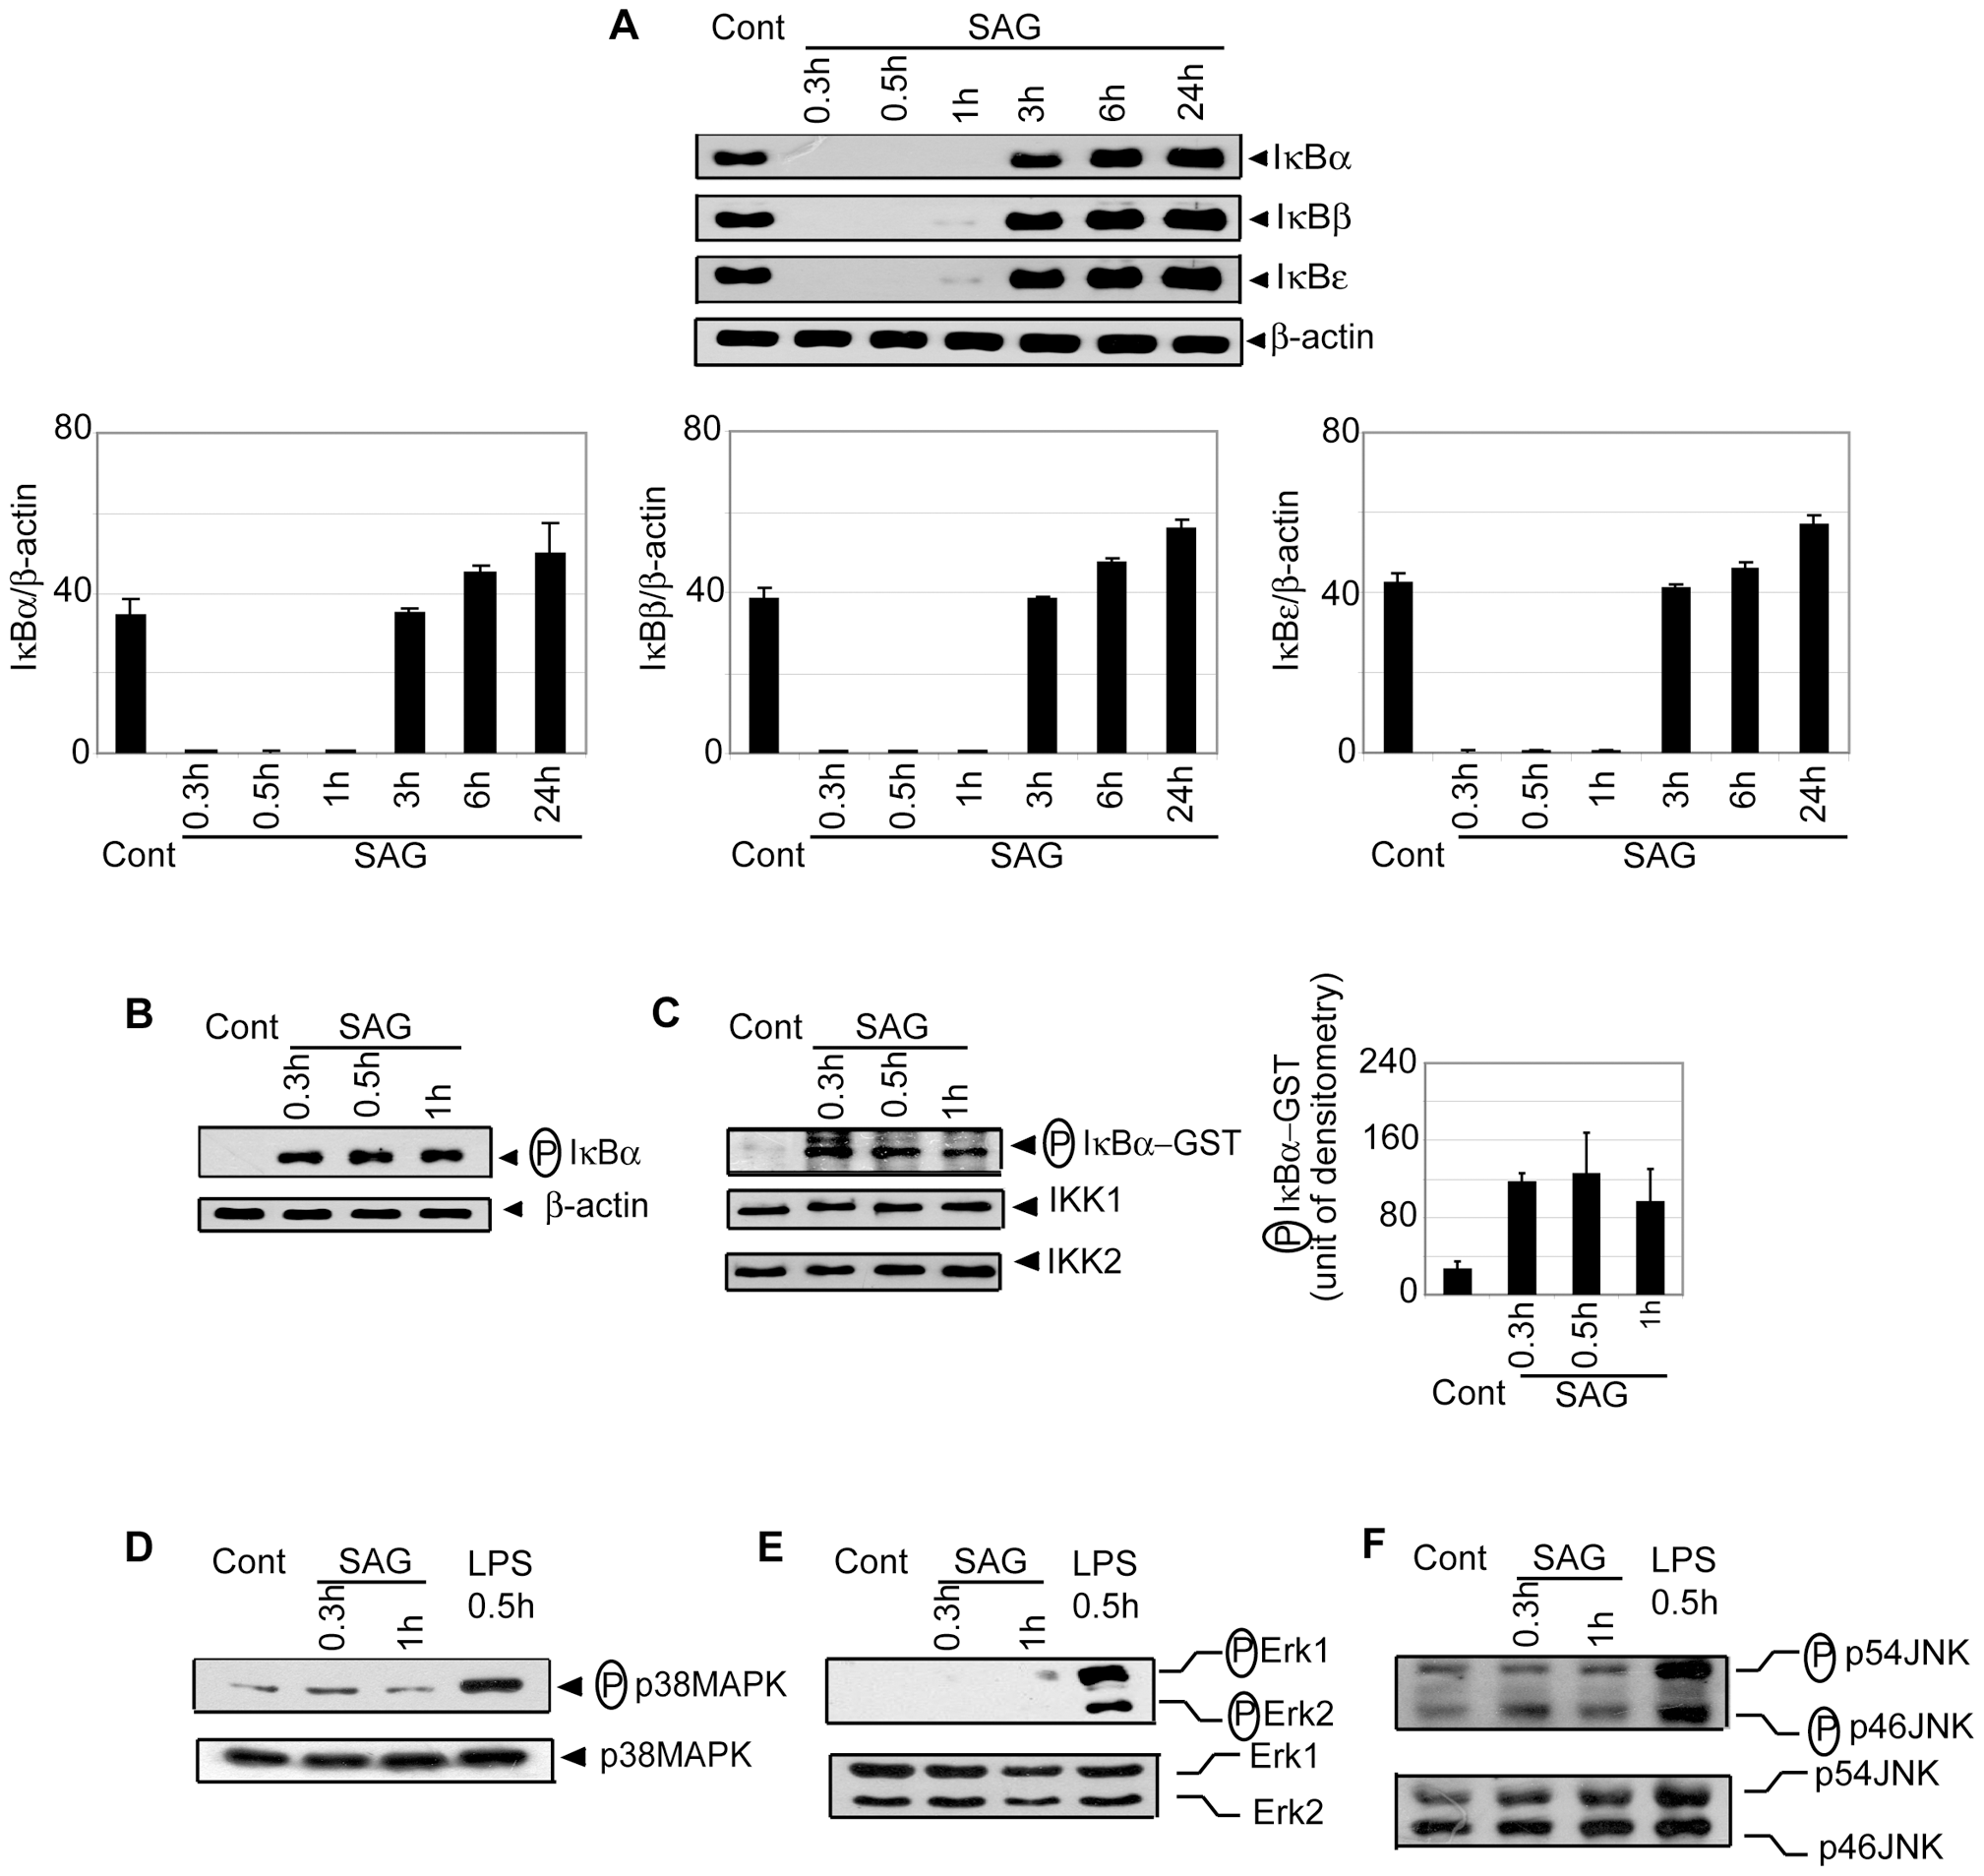 SAG-treated BMDCs exhibit increased phosphorylation and degradation of IκB proteins and IKK activity.